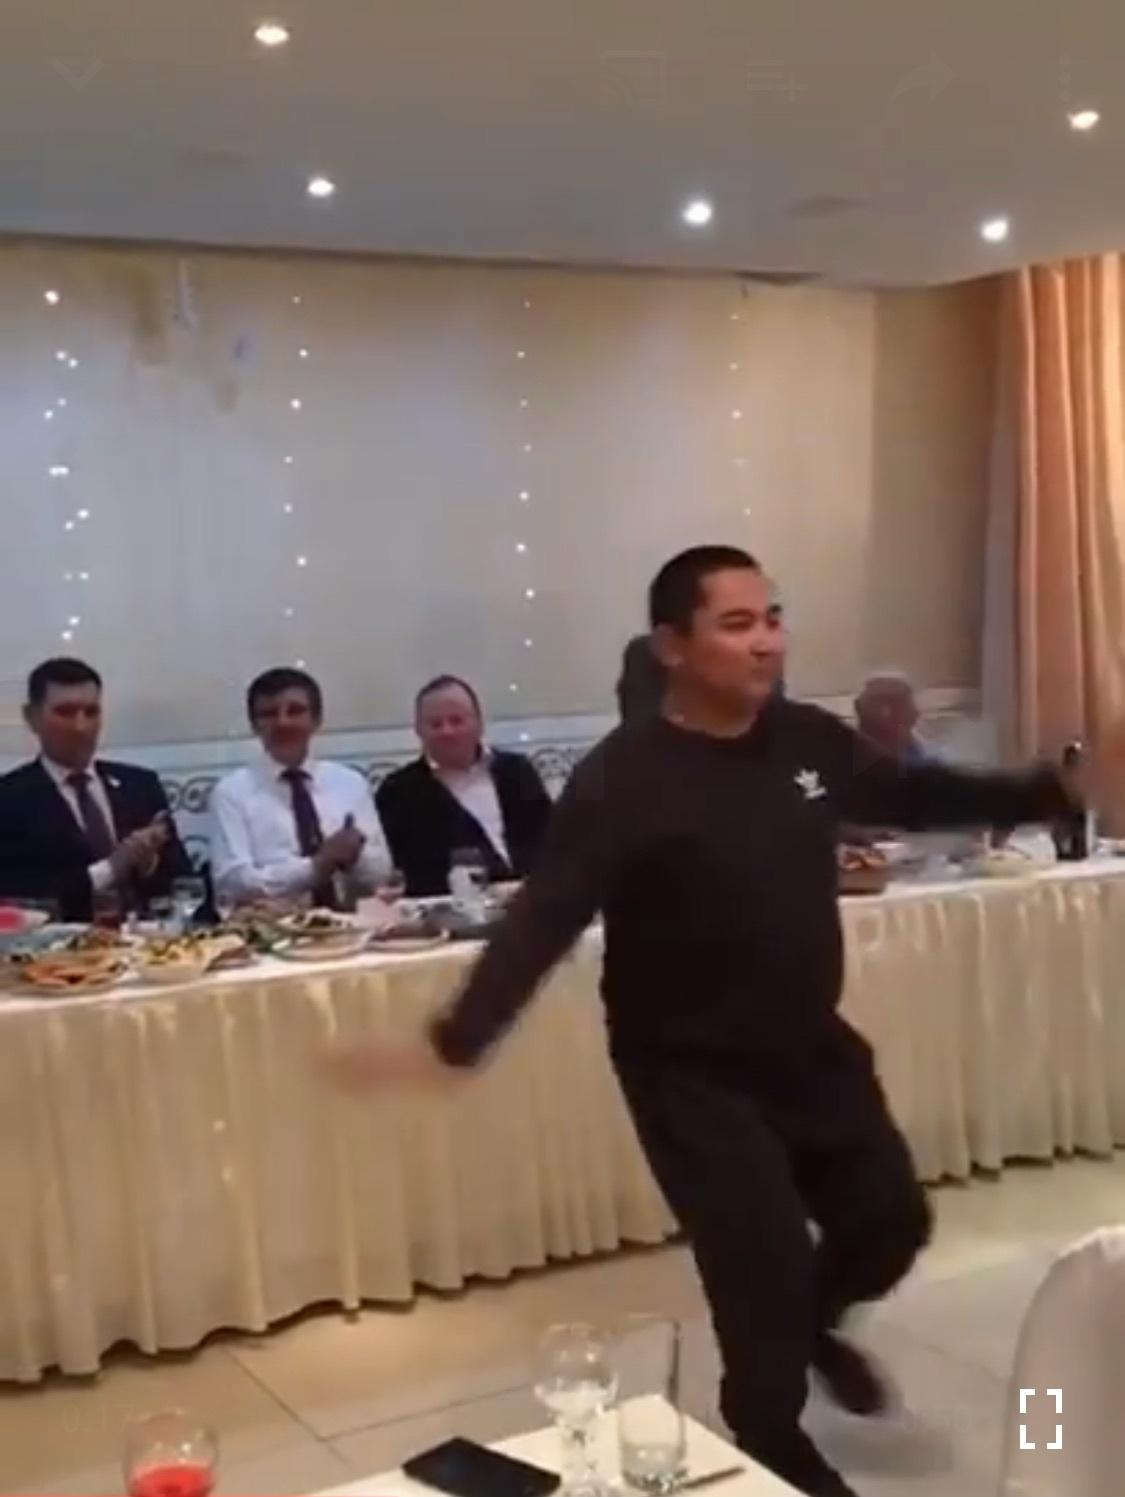 Киргизская диаспора поздравляет Павла ПИНИГИНА с юбилеем